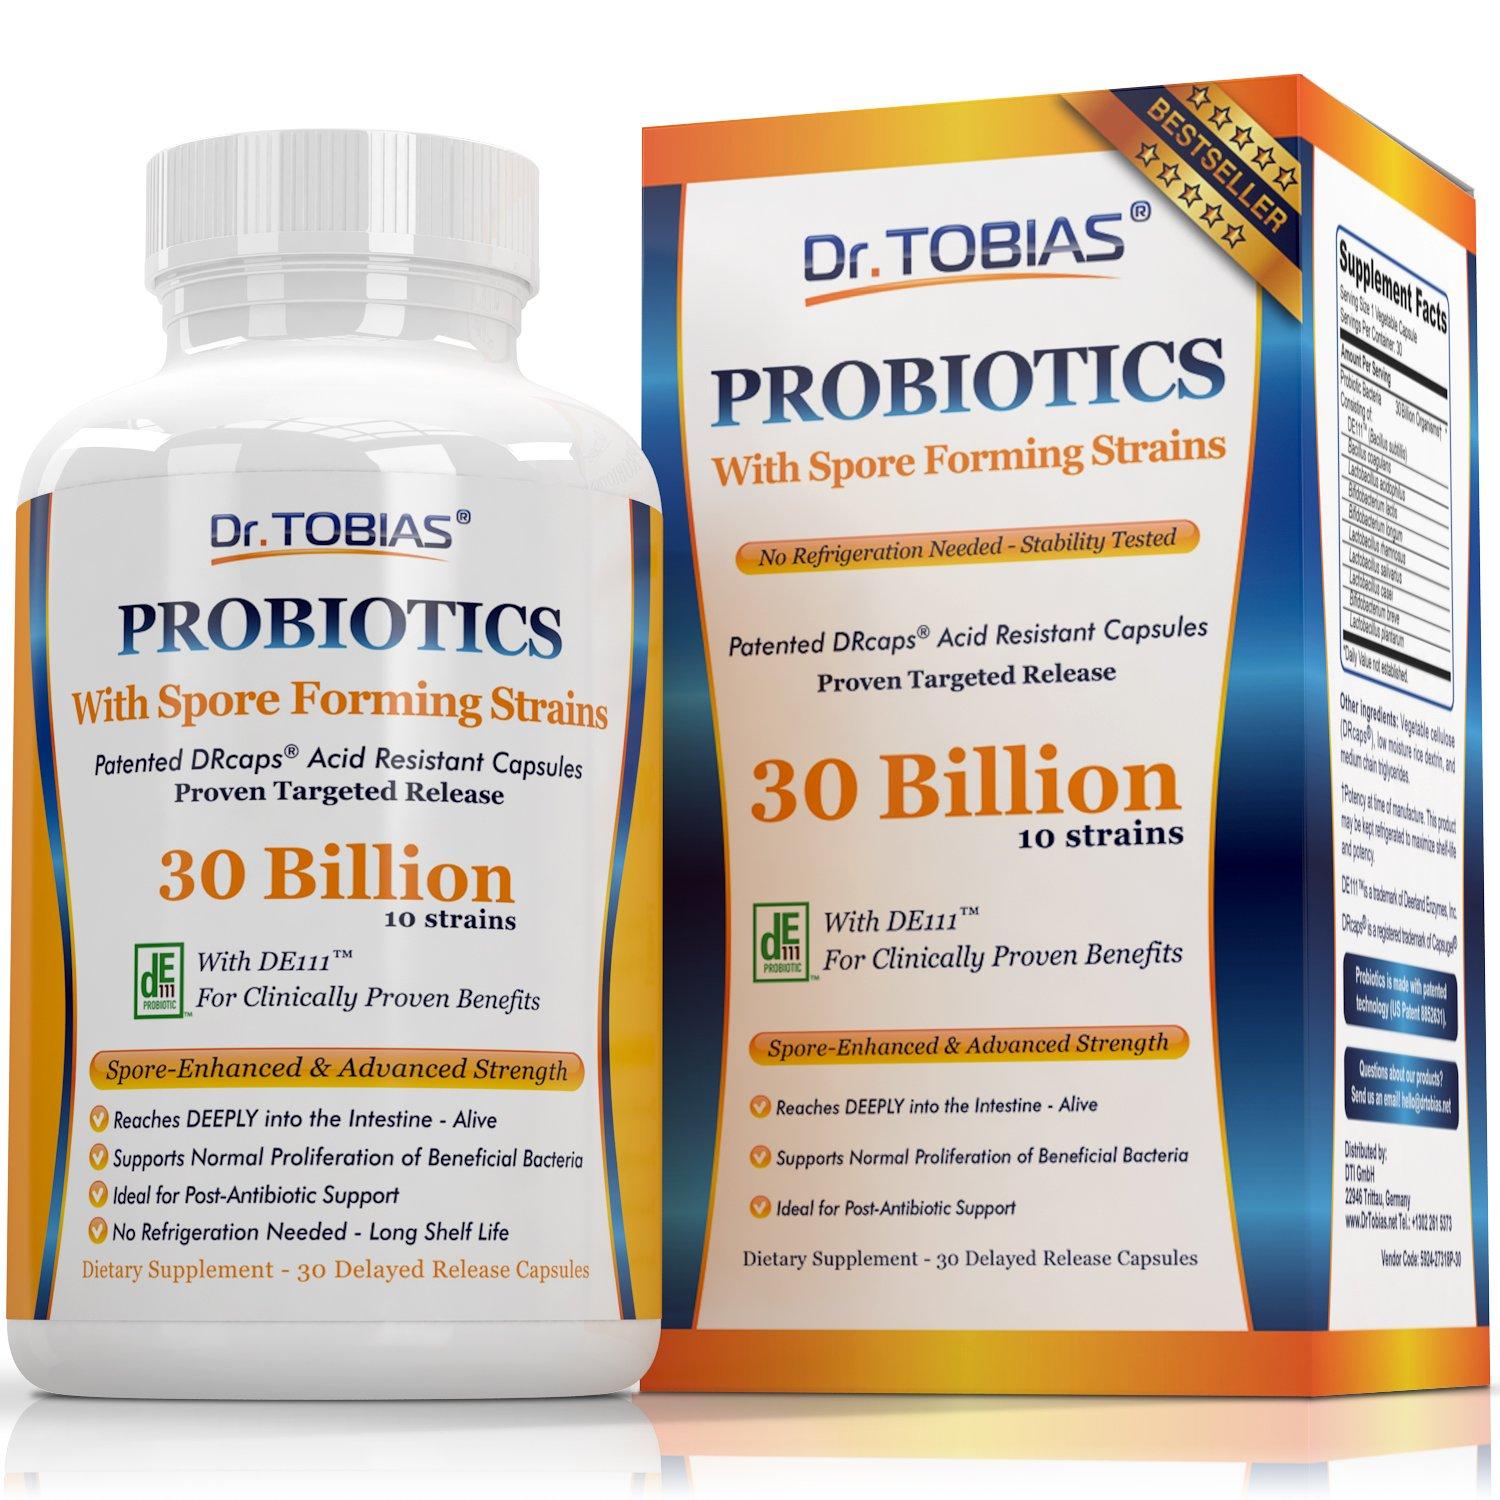 Dr. Tobias Probiotics for Women and Men: 30 Billion CFUs, 10 Strains, Delay Release & Spore Forming Strains - Probiotic Supplement for Women and Men - Great for Post-Antibiotic, Health & Gut Support